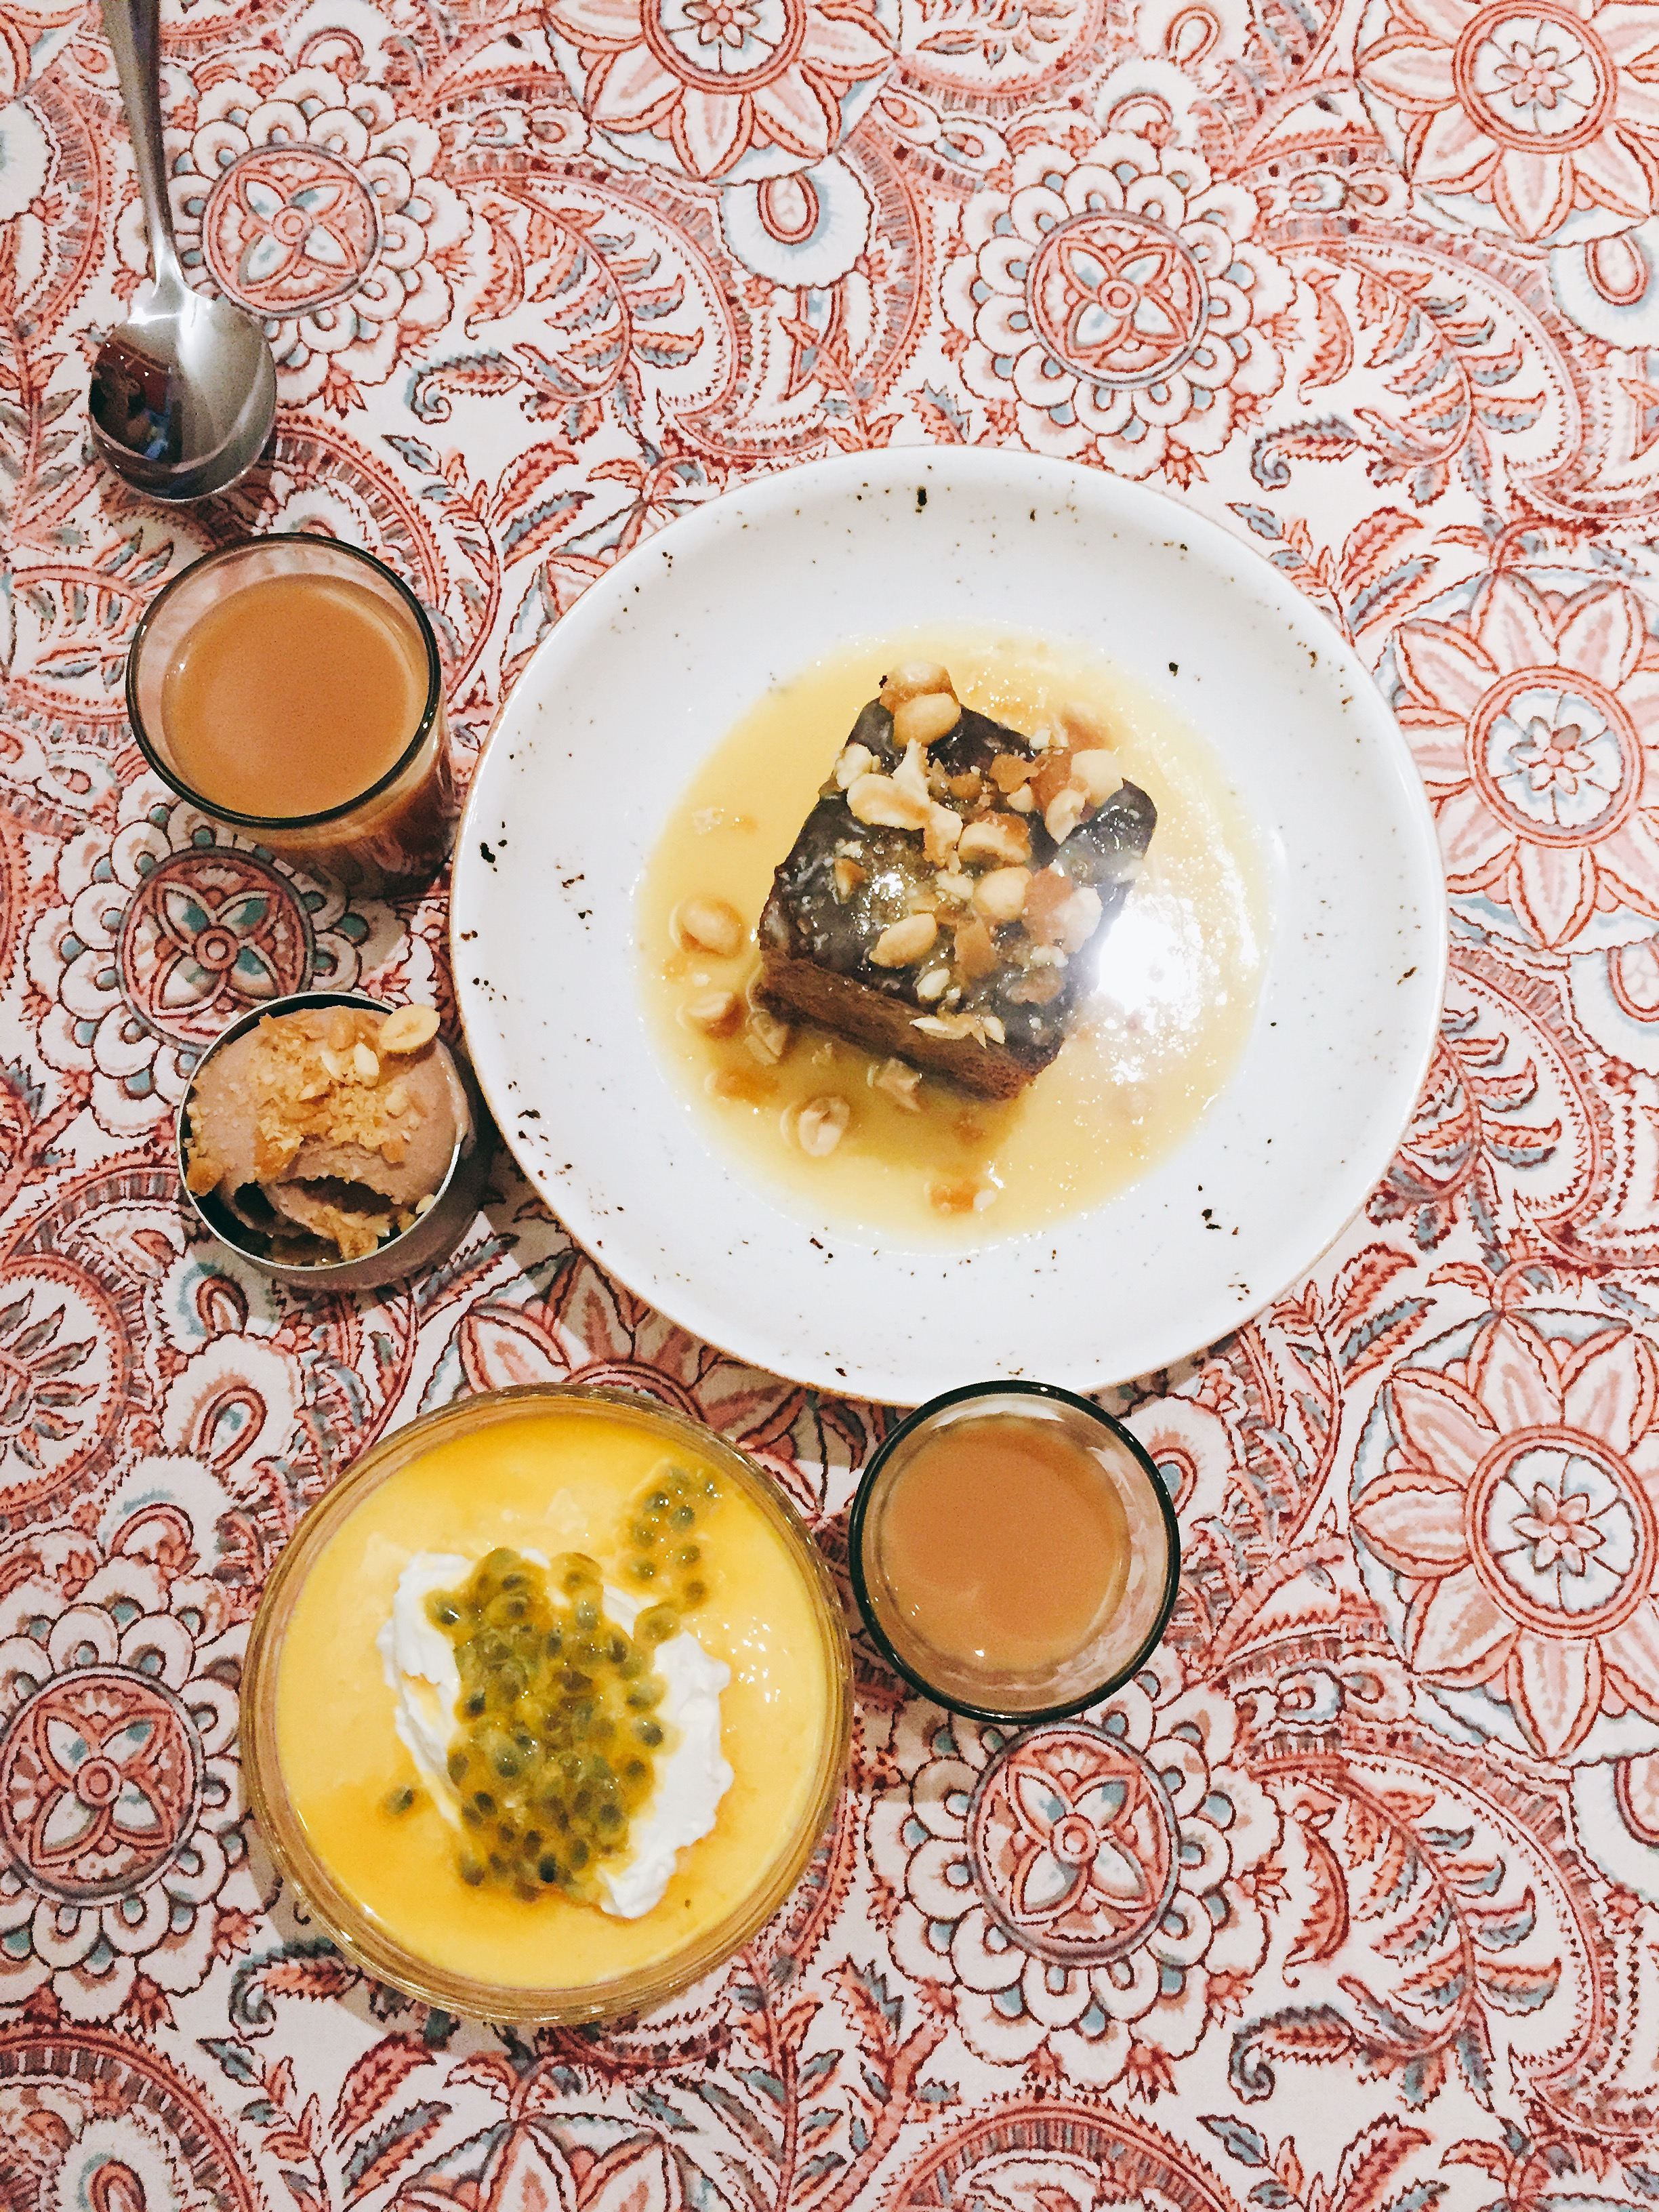 Dessert - Jikoni London restaurant review